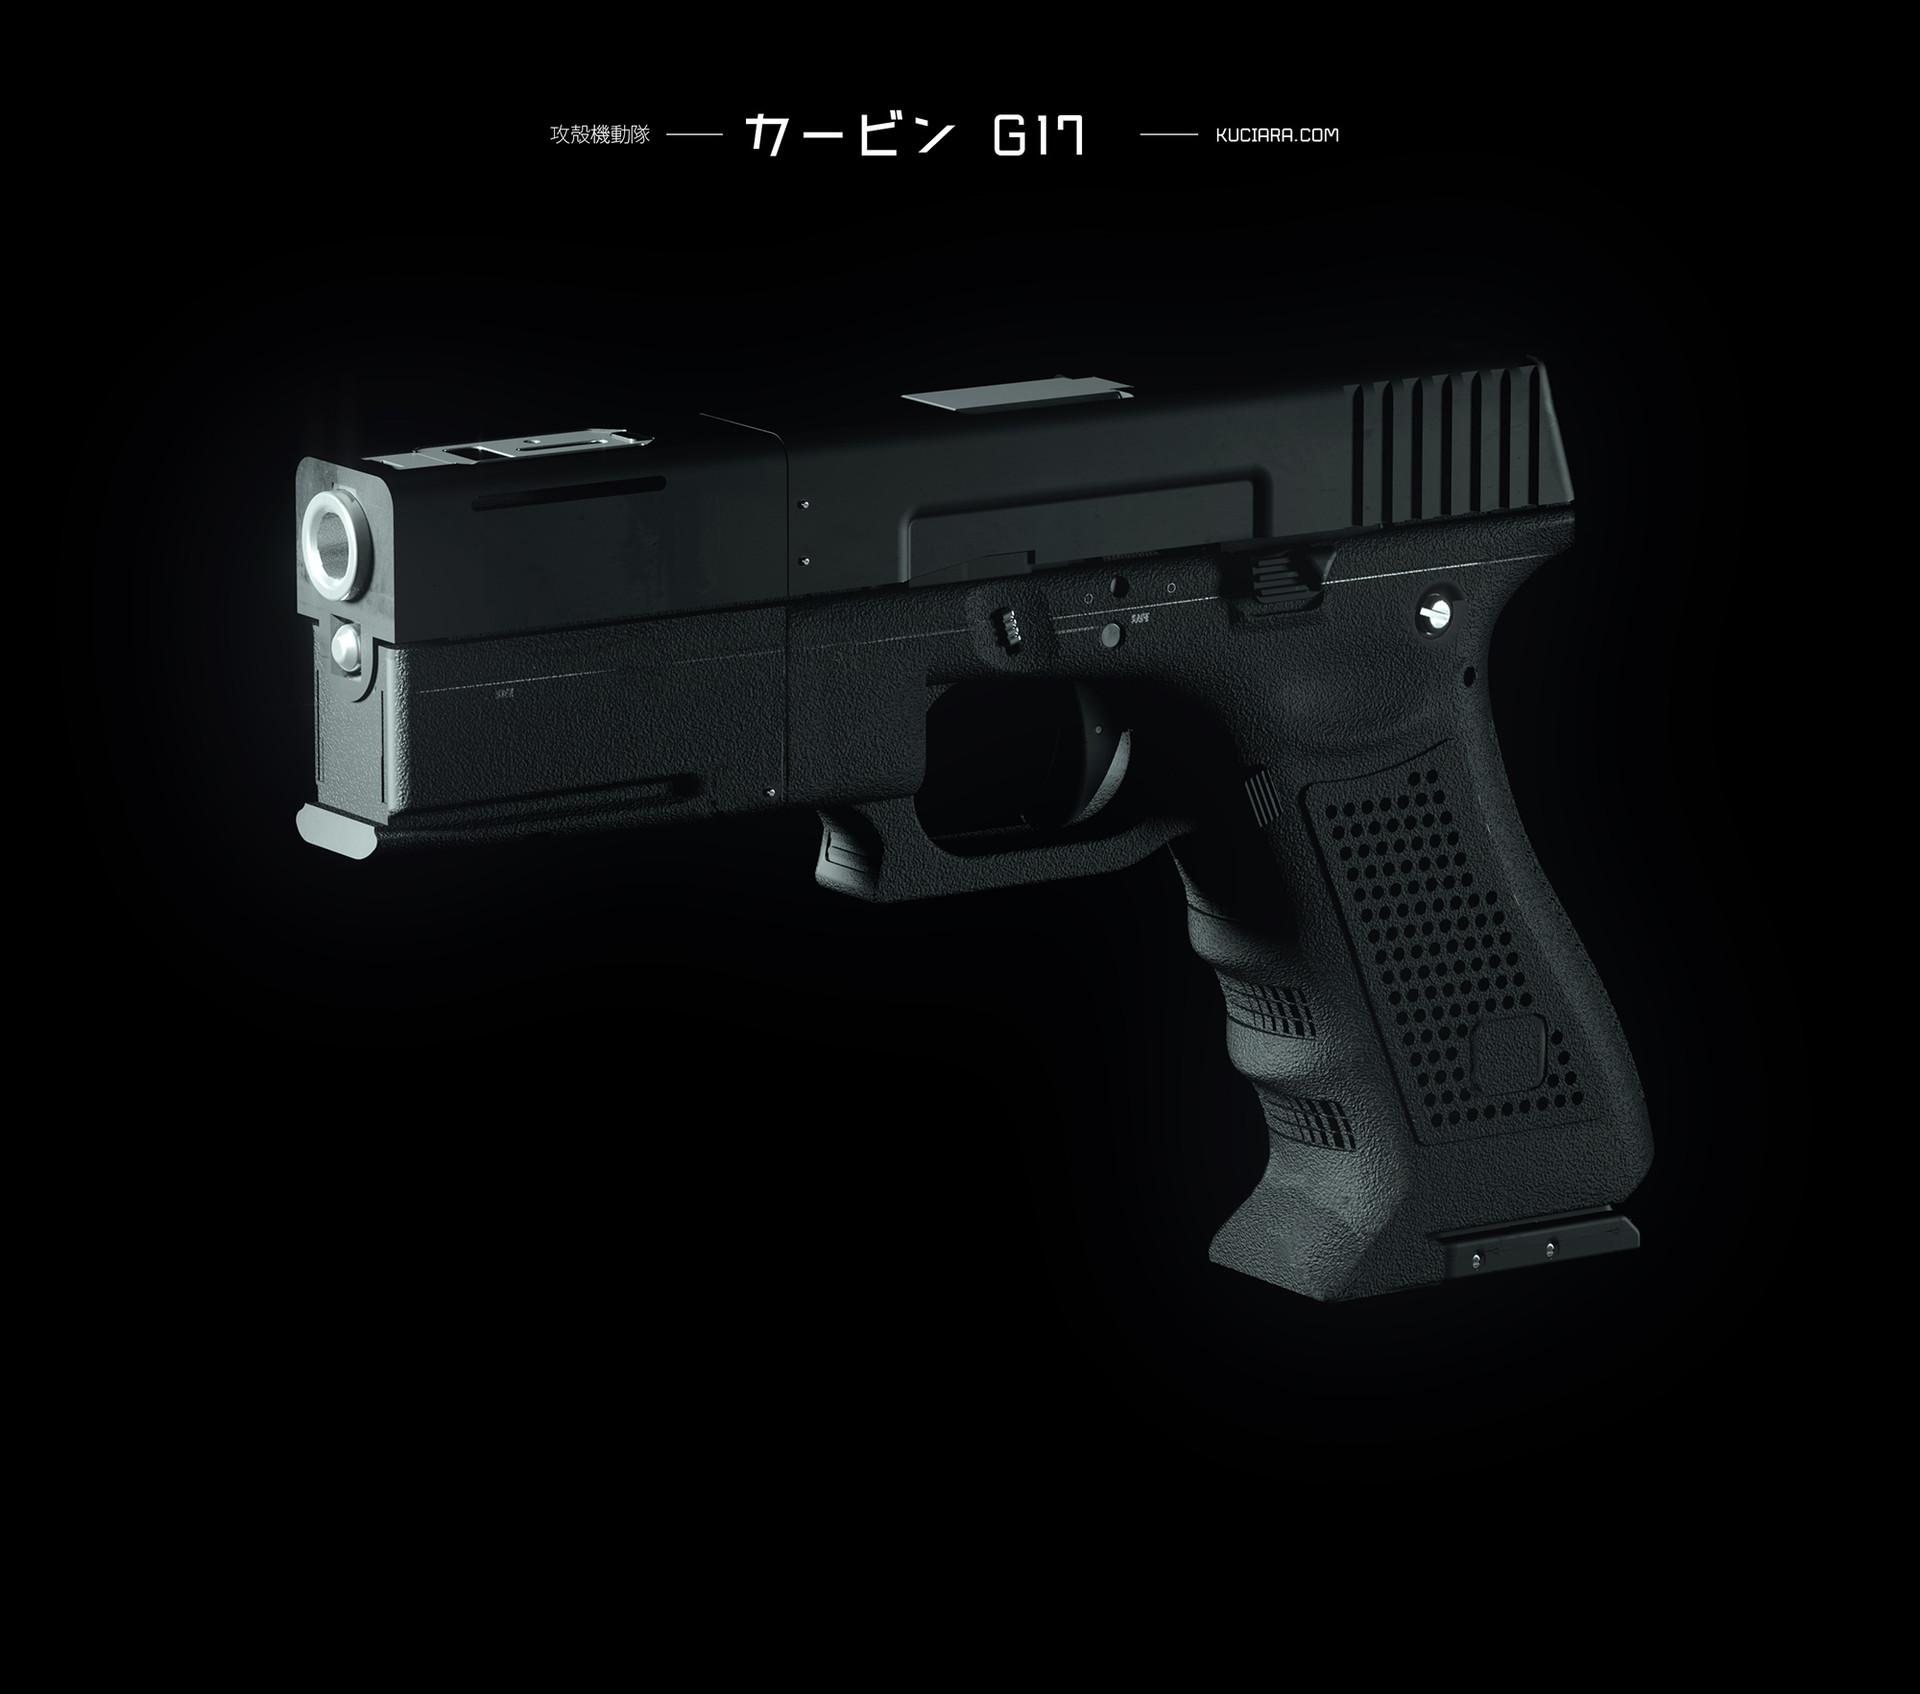 Maciej kuciara 151815 wpn pistol mk v001